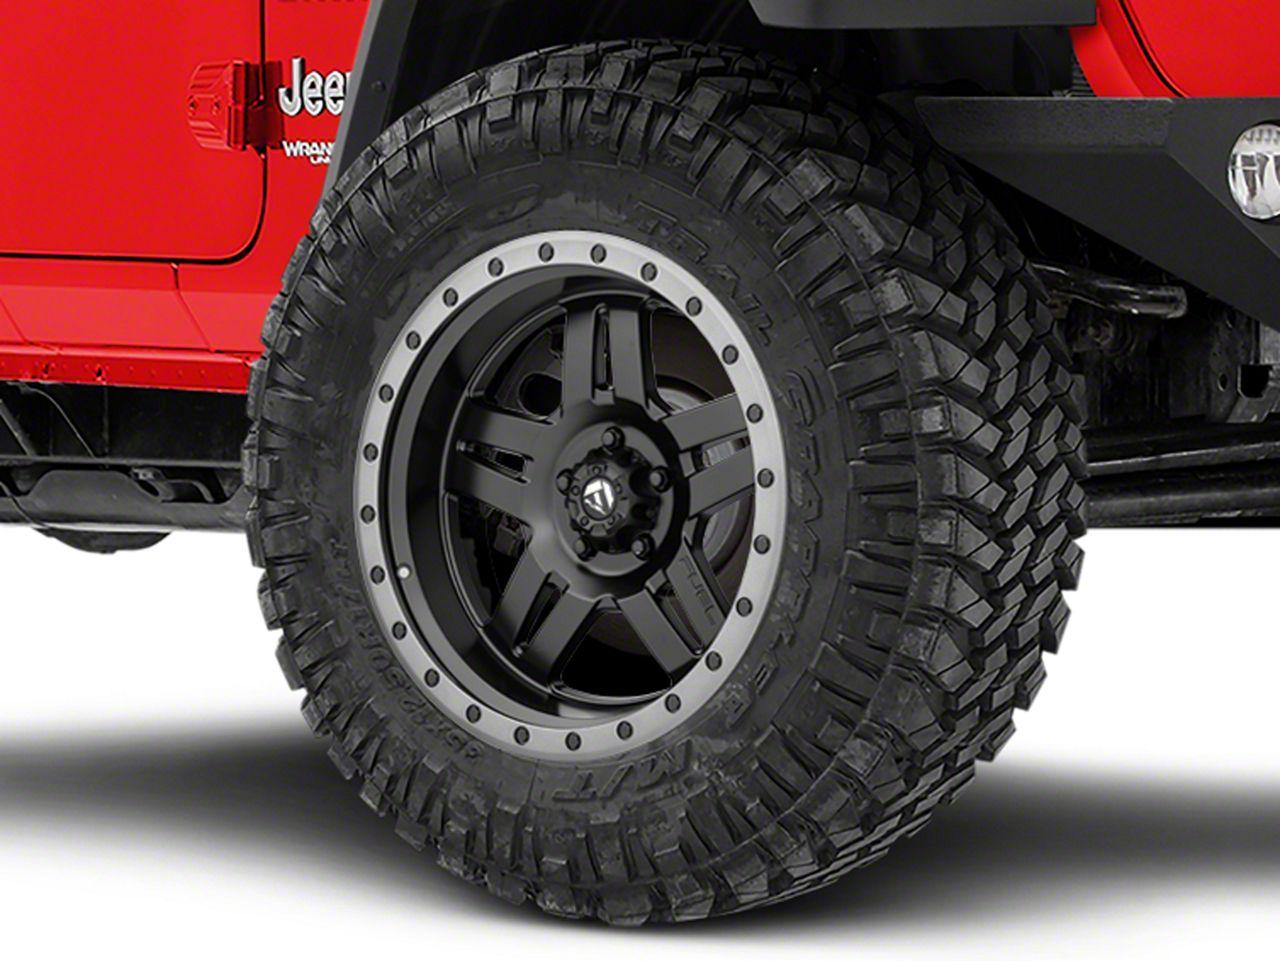 Fuel Wheels Anza Matte Black Wheel - 20x10 (18-19 Jeep Wrangler JL)